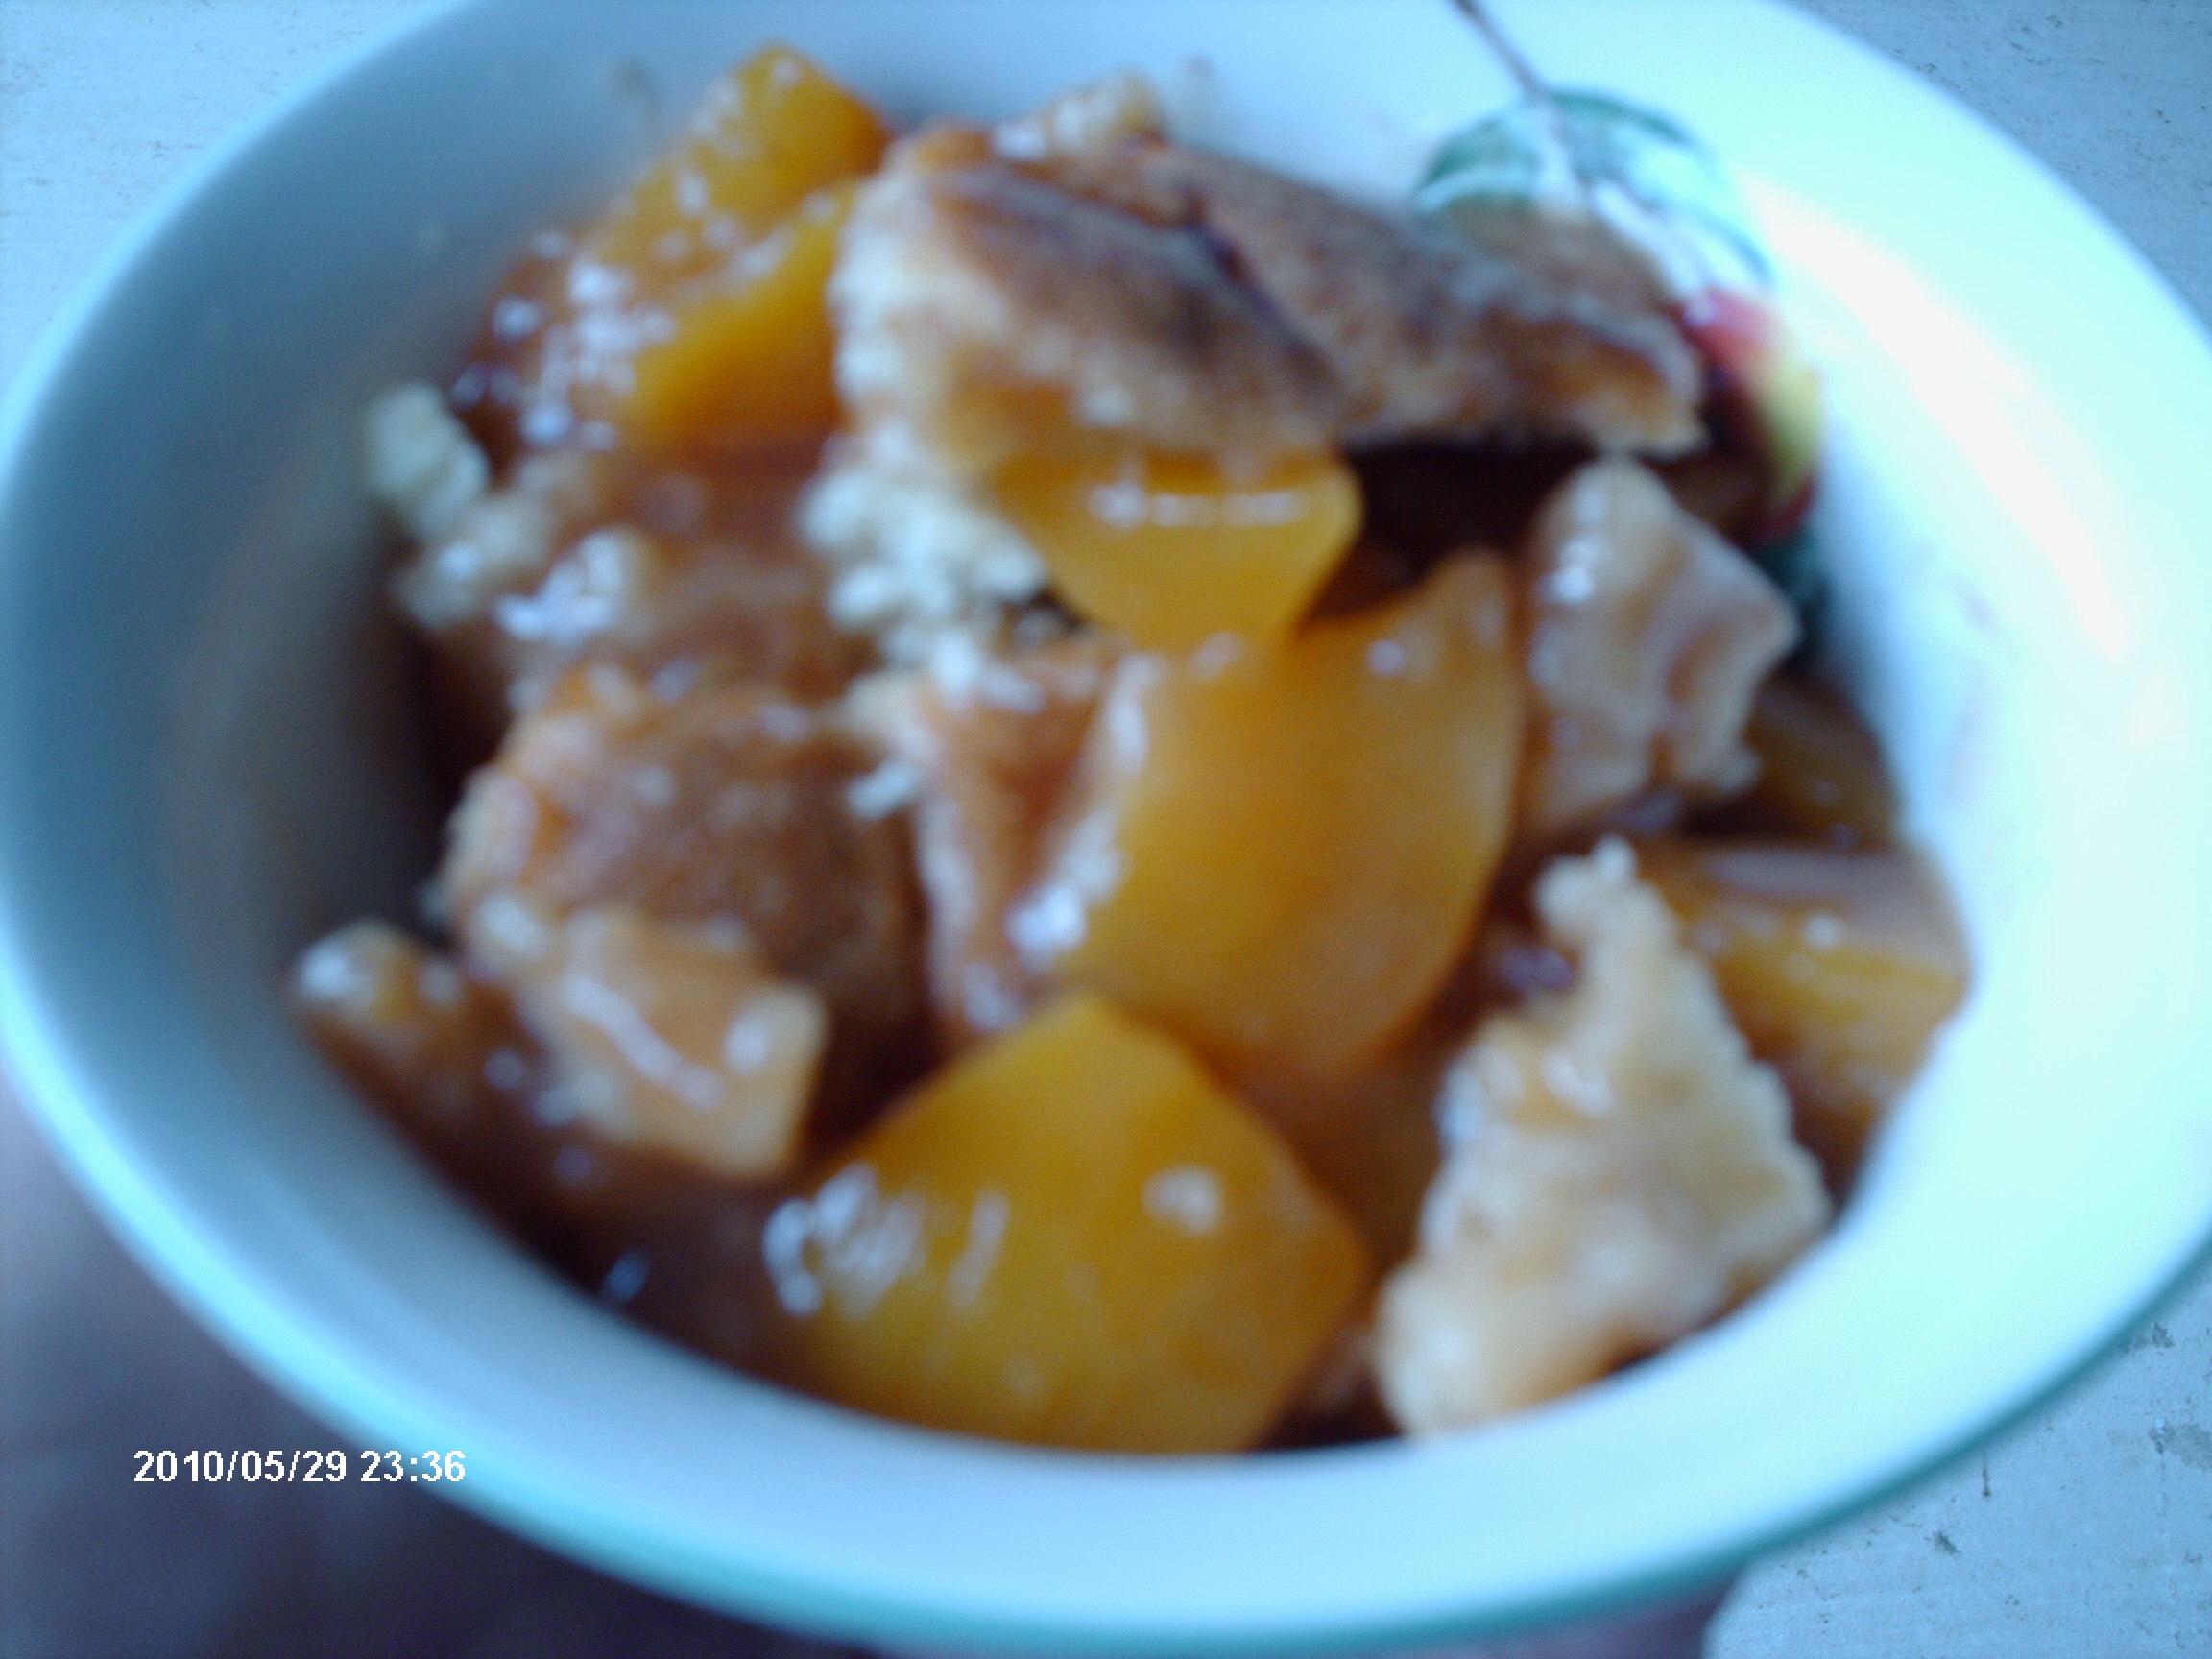 Apricot Nectar Cake Recipe Lemon Jello: Tasty Kitchen: A Happy Recipe Community